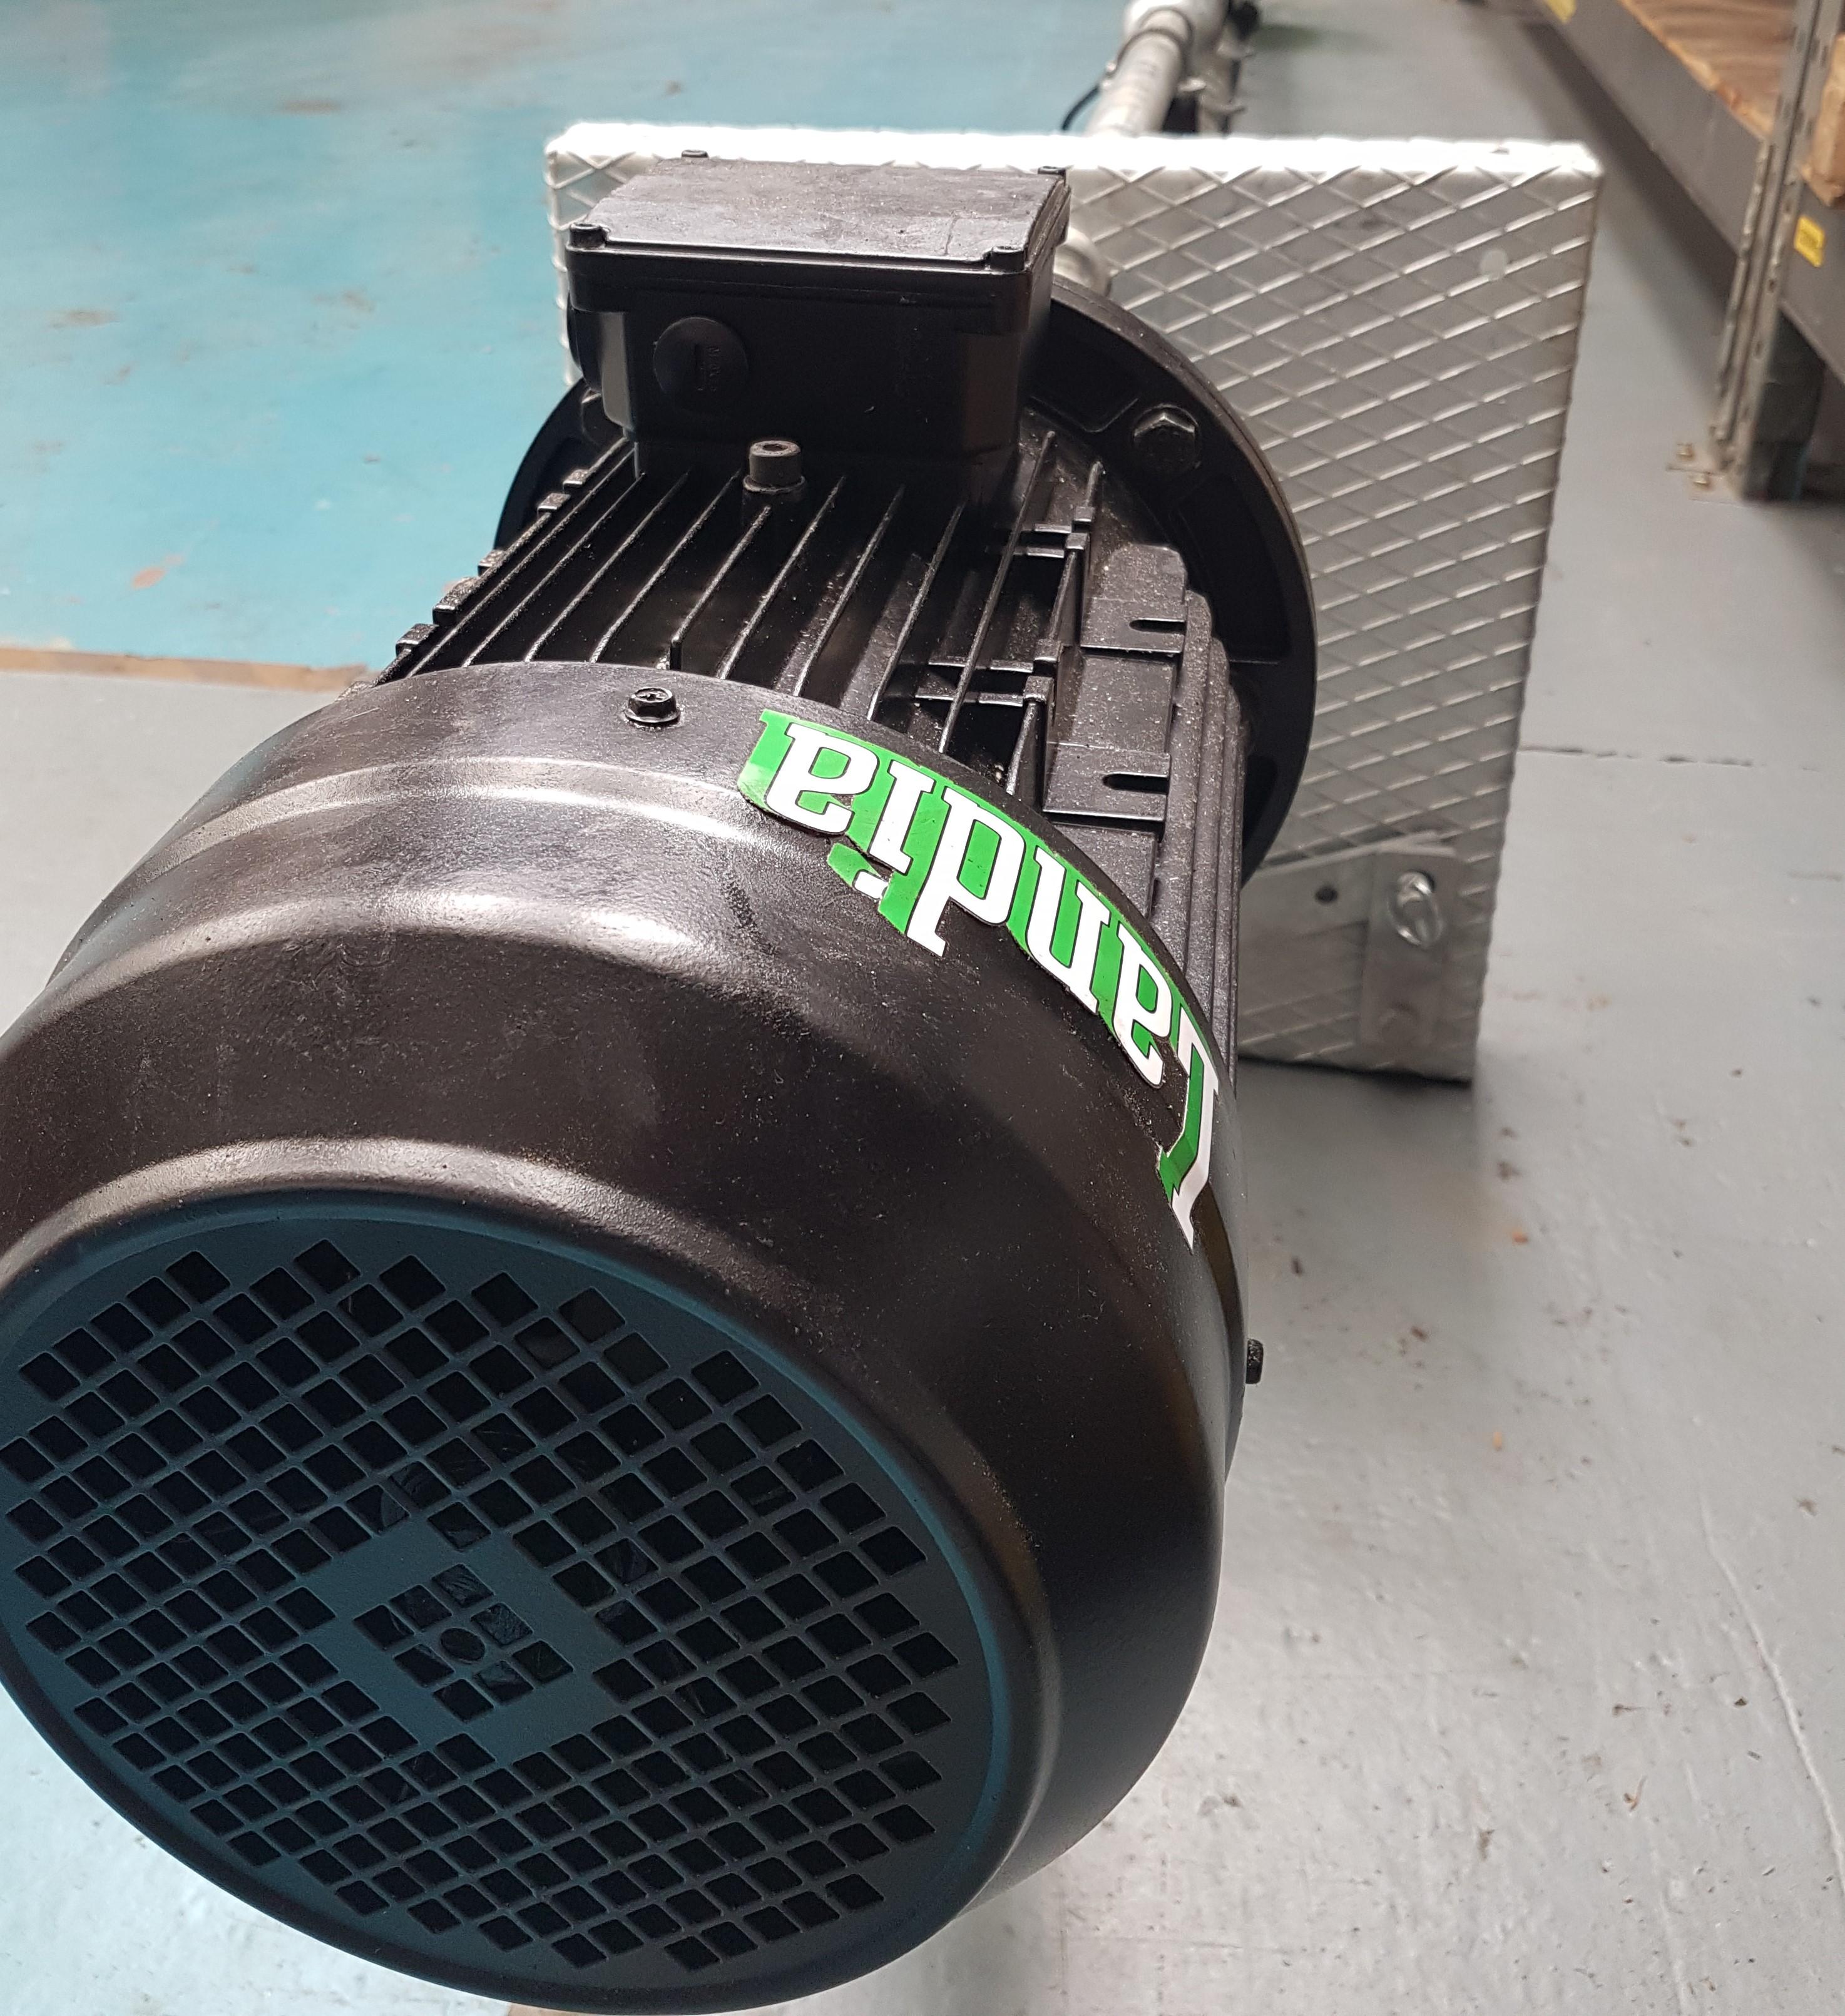 The long-shaft chopper pump